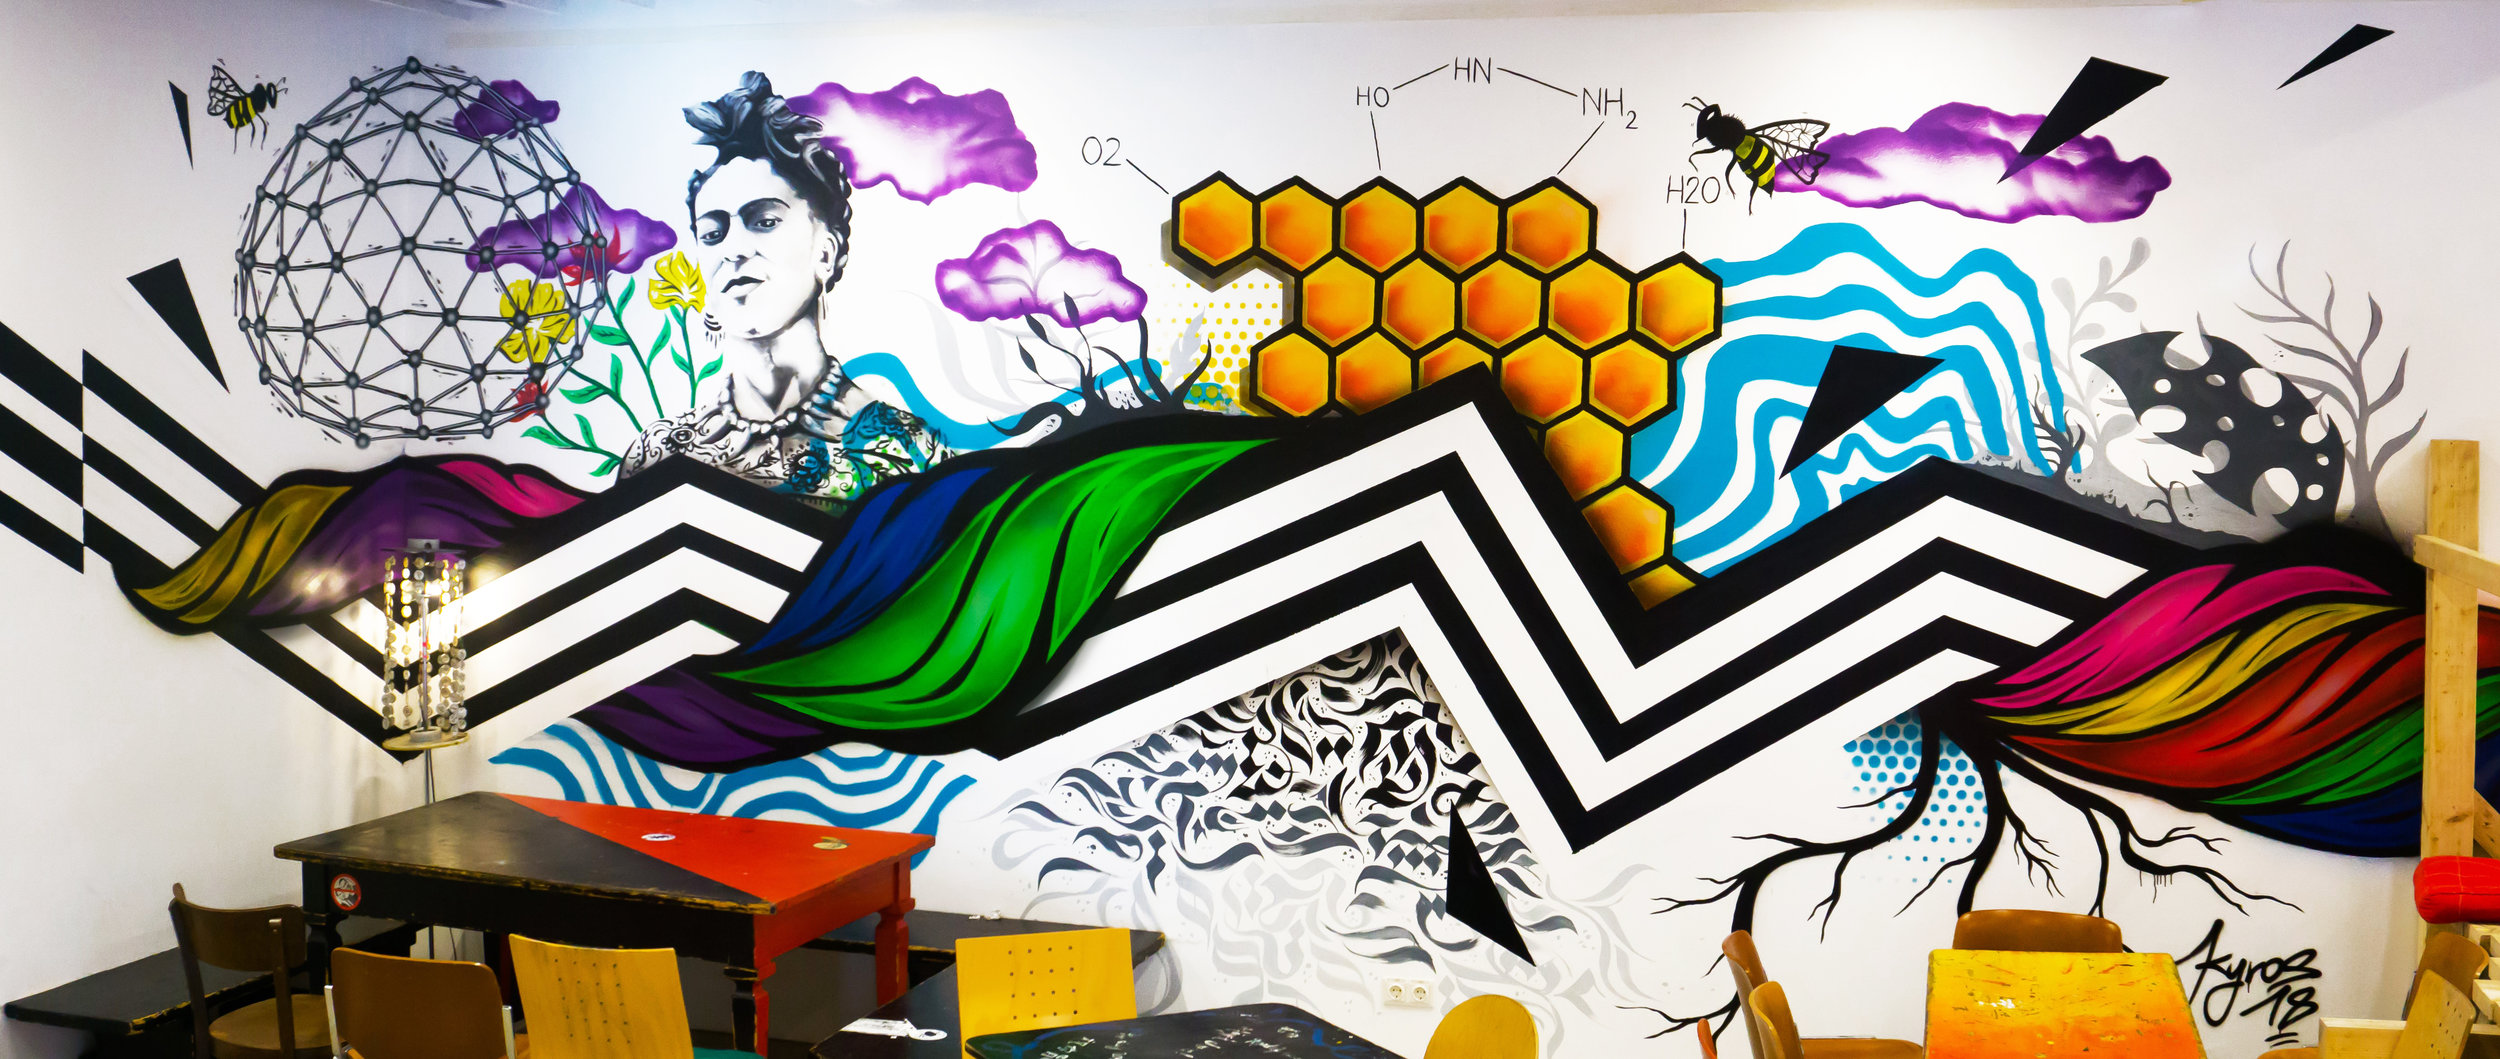 space+branding,+graffiti,+street+art,+streetart,+vienna,+wien.jpg